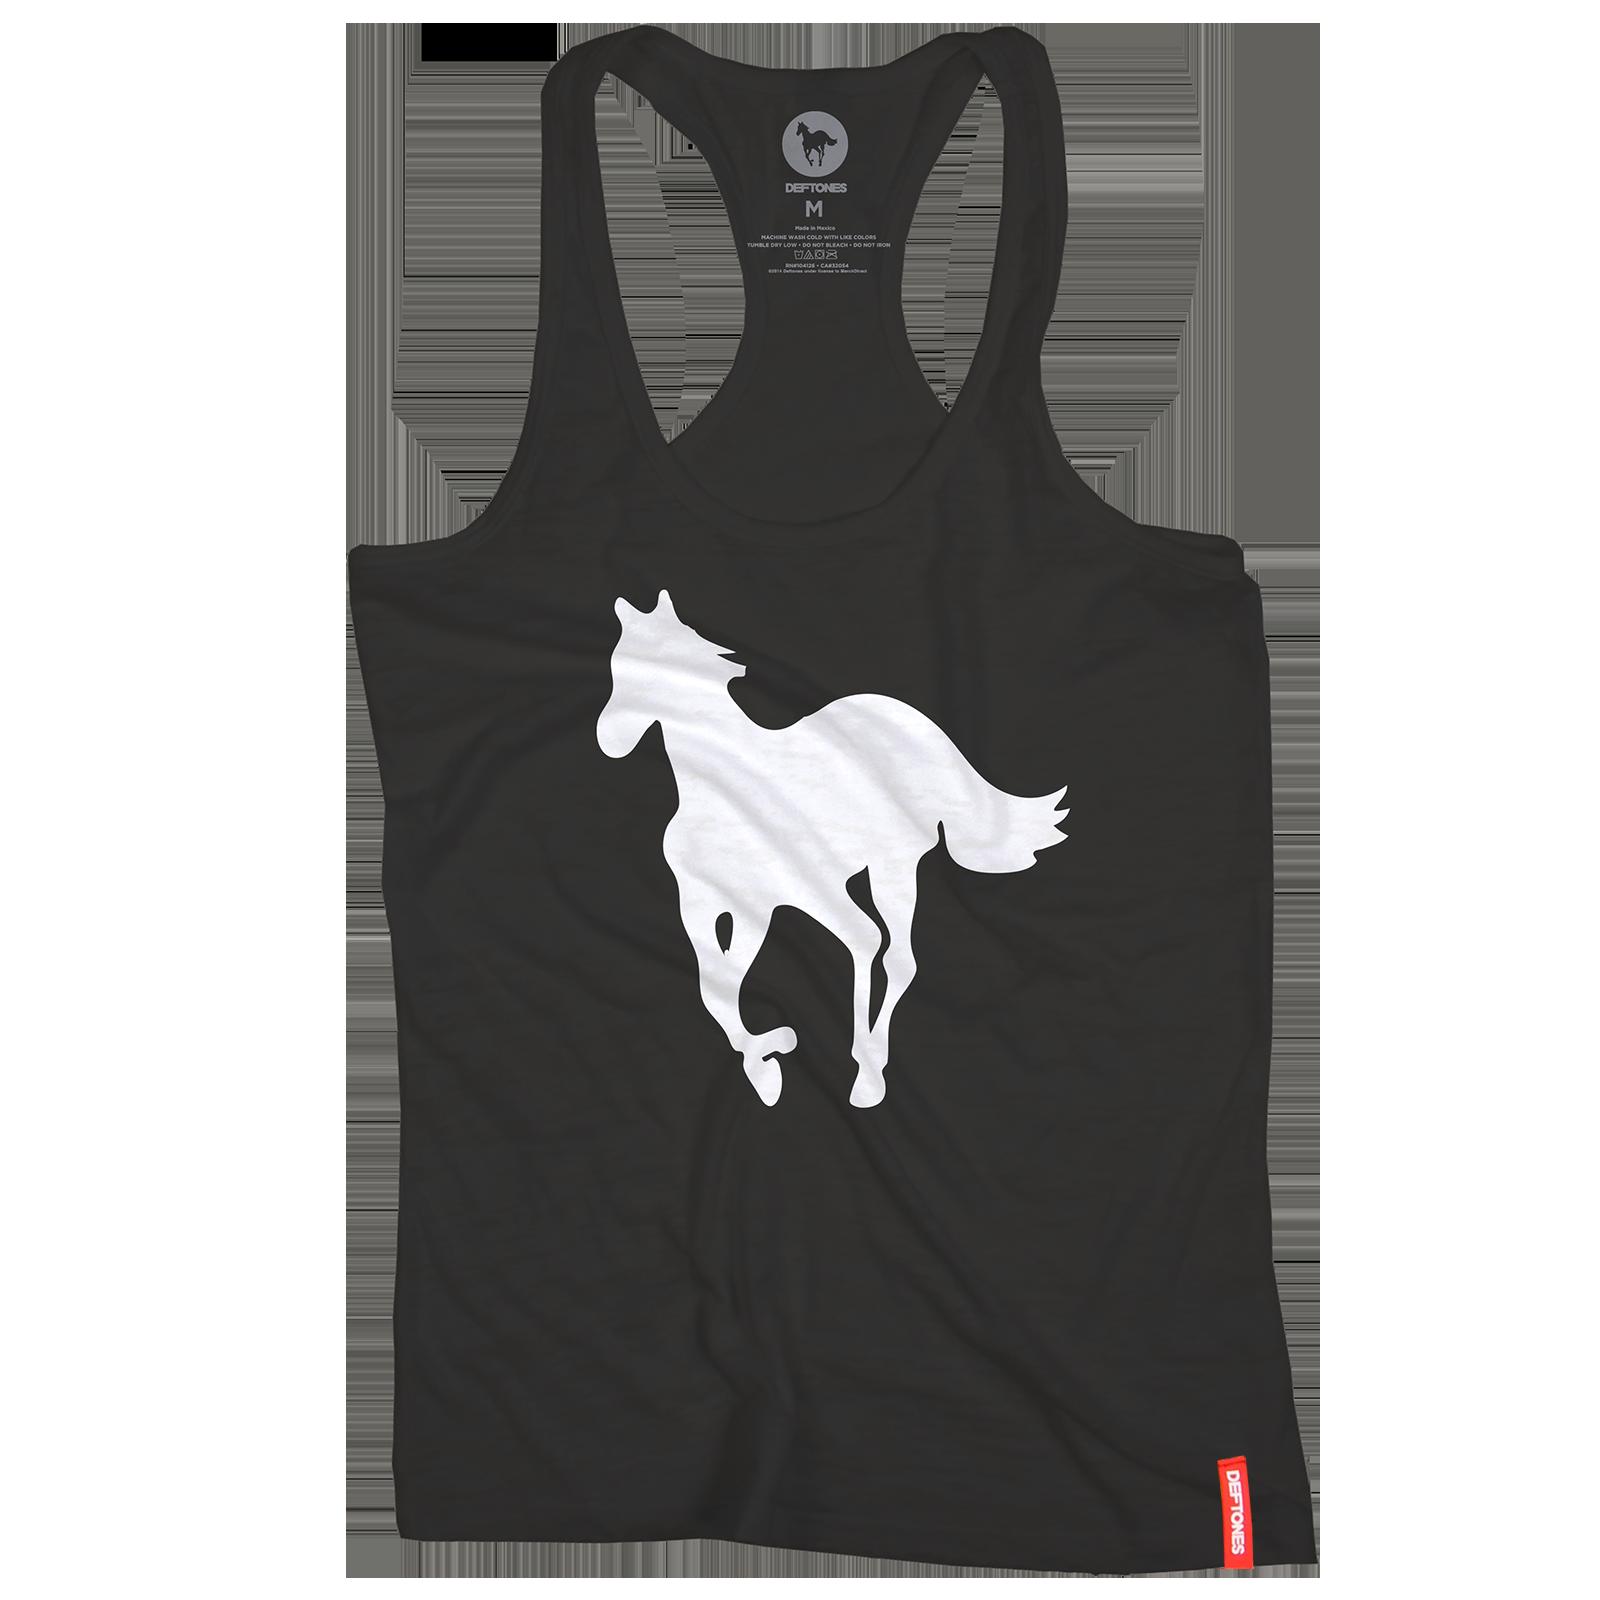 T shirt deftones white pony - Deftones White Pony Racer Back Women S Black Tank Top